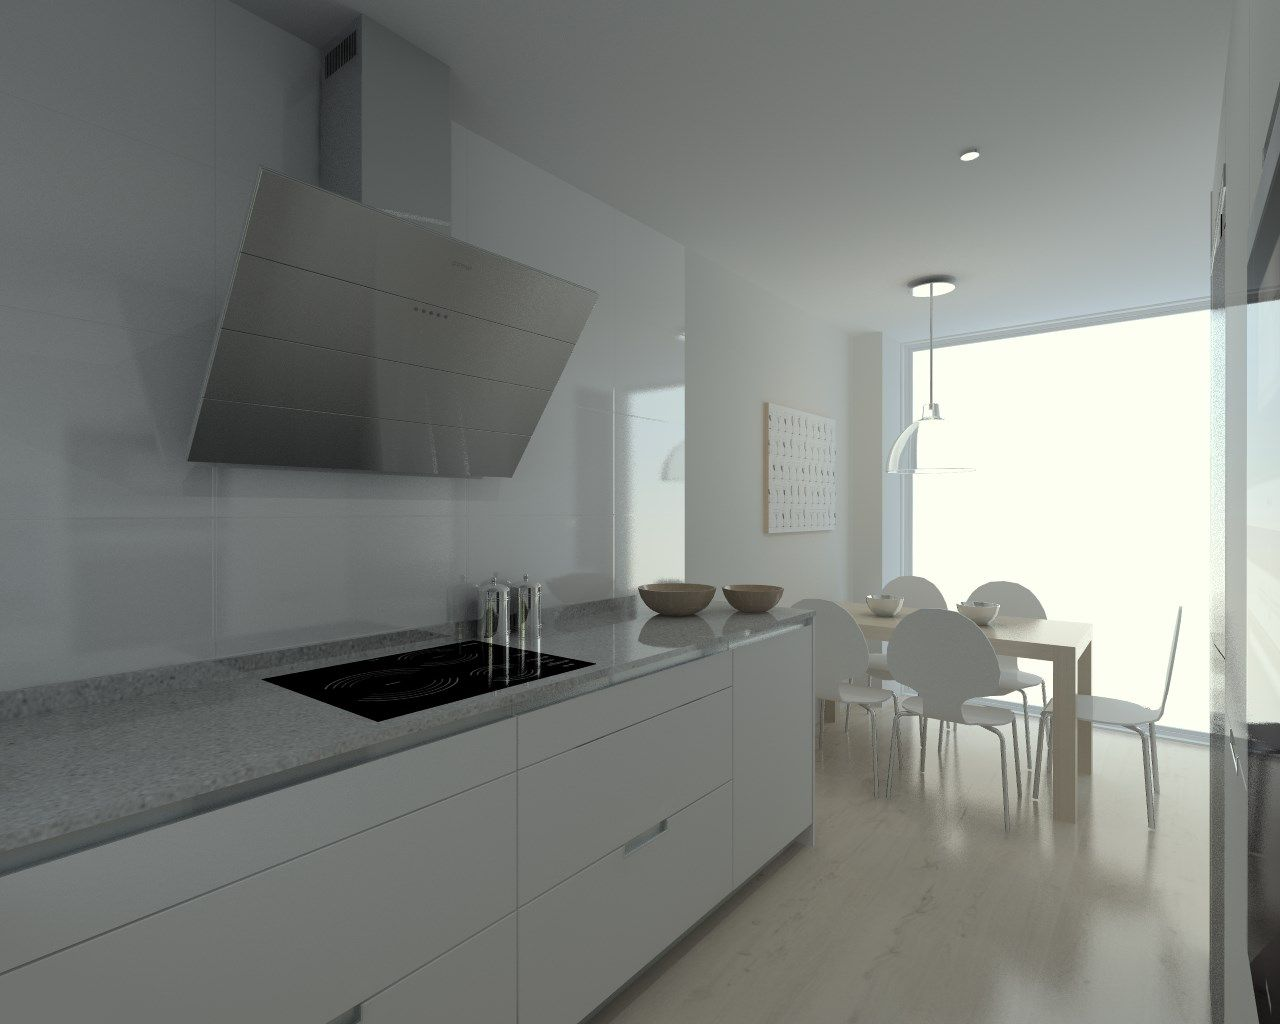 Cocina santos modelo minos laminado seda blanco encimera - Silestone aluminio nube ...